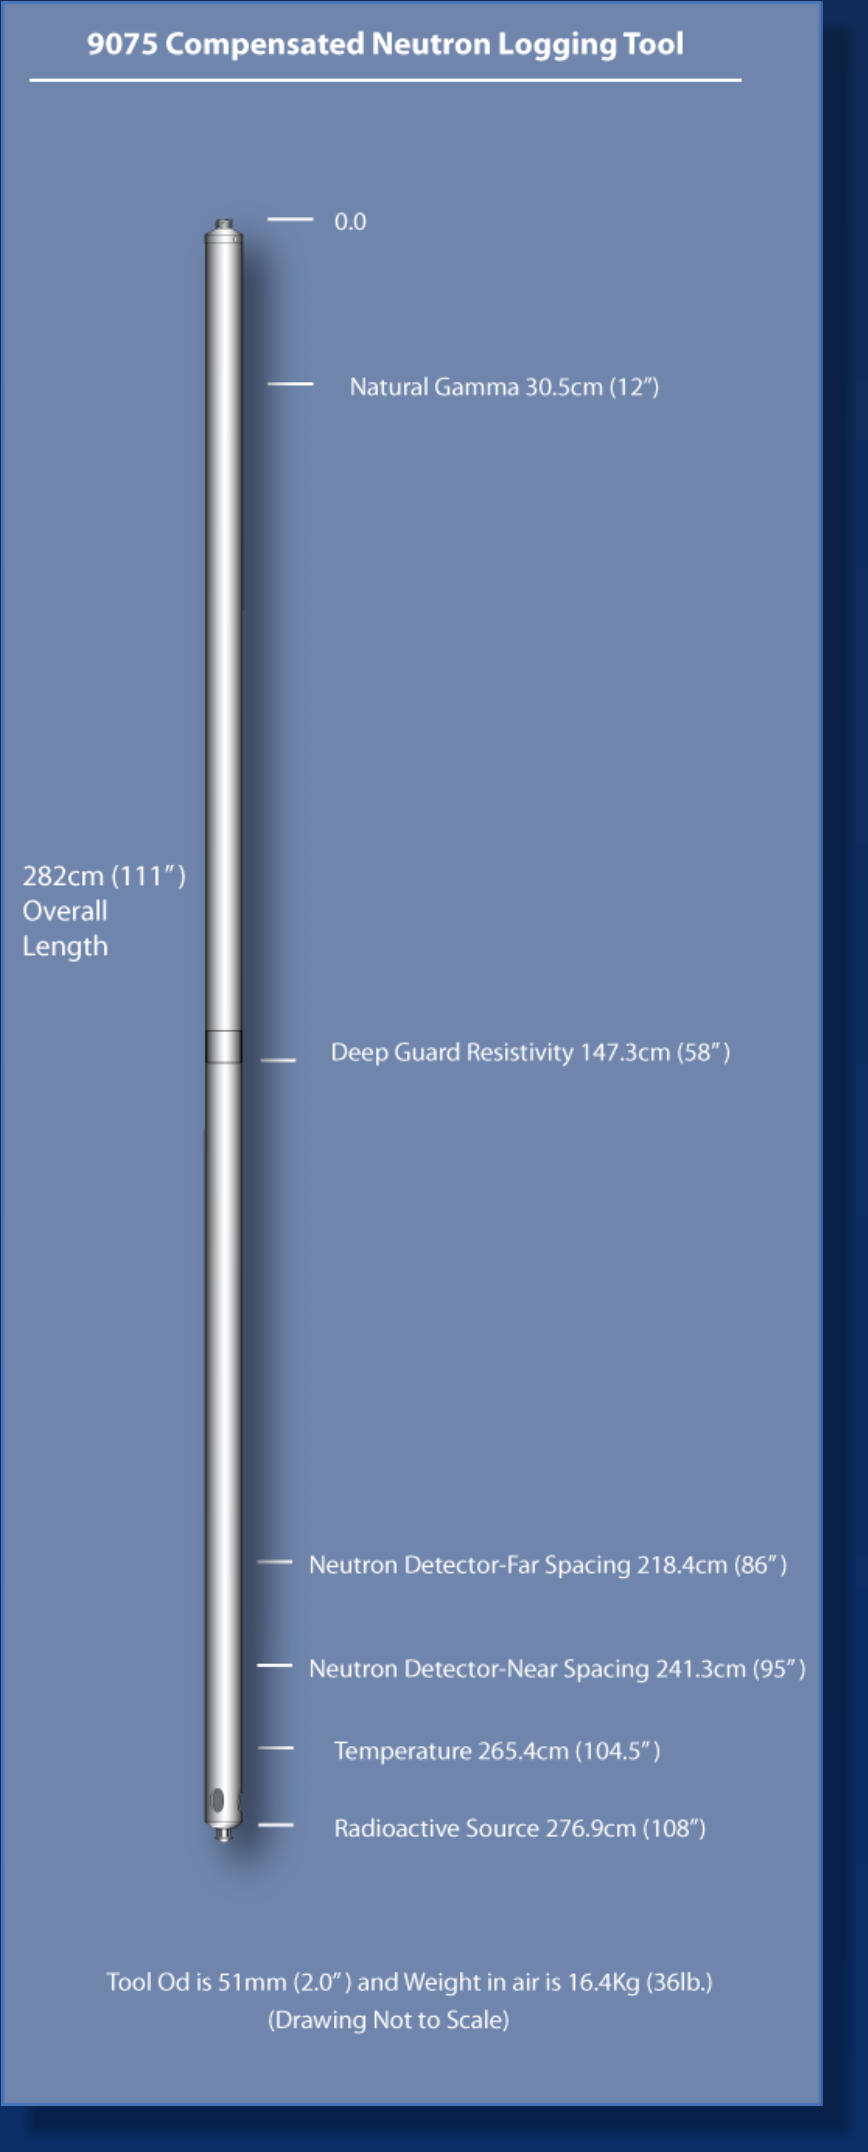 deepguard 5.0